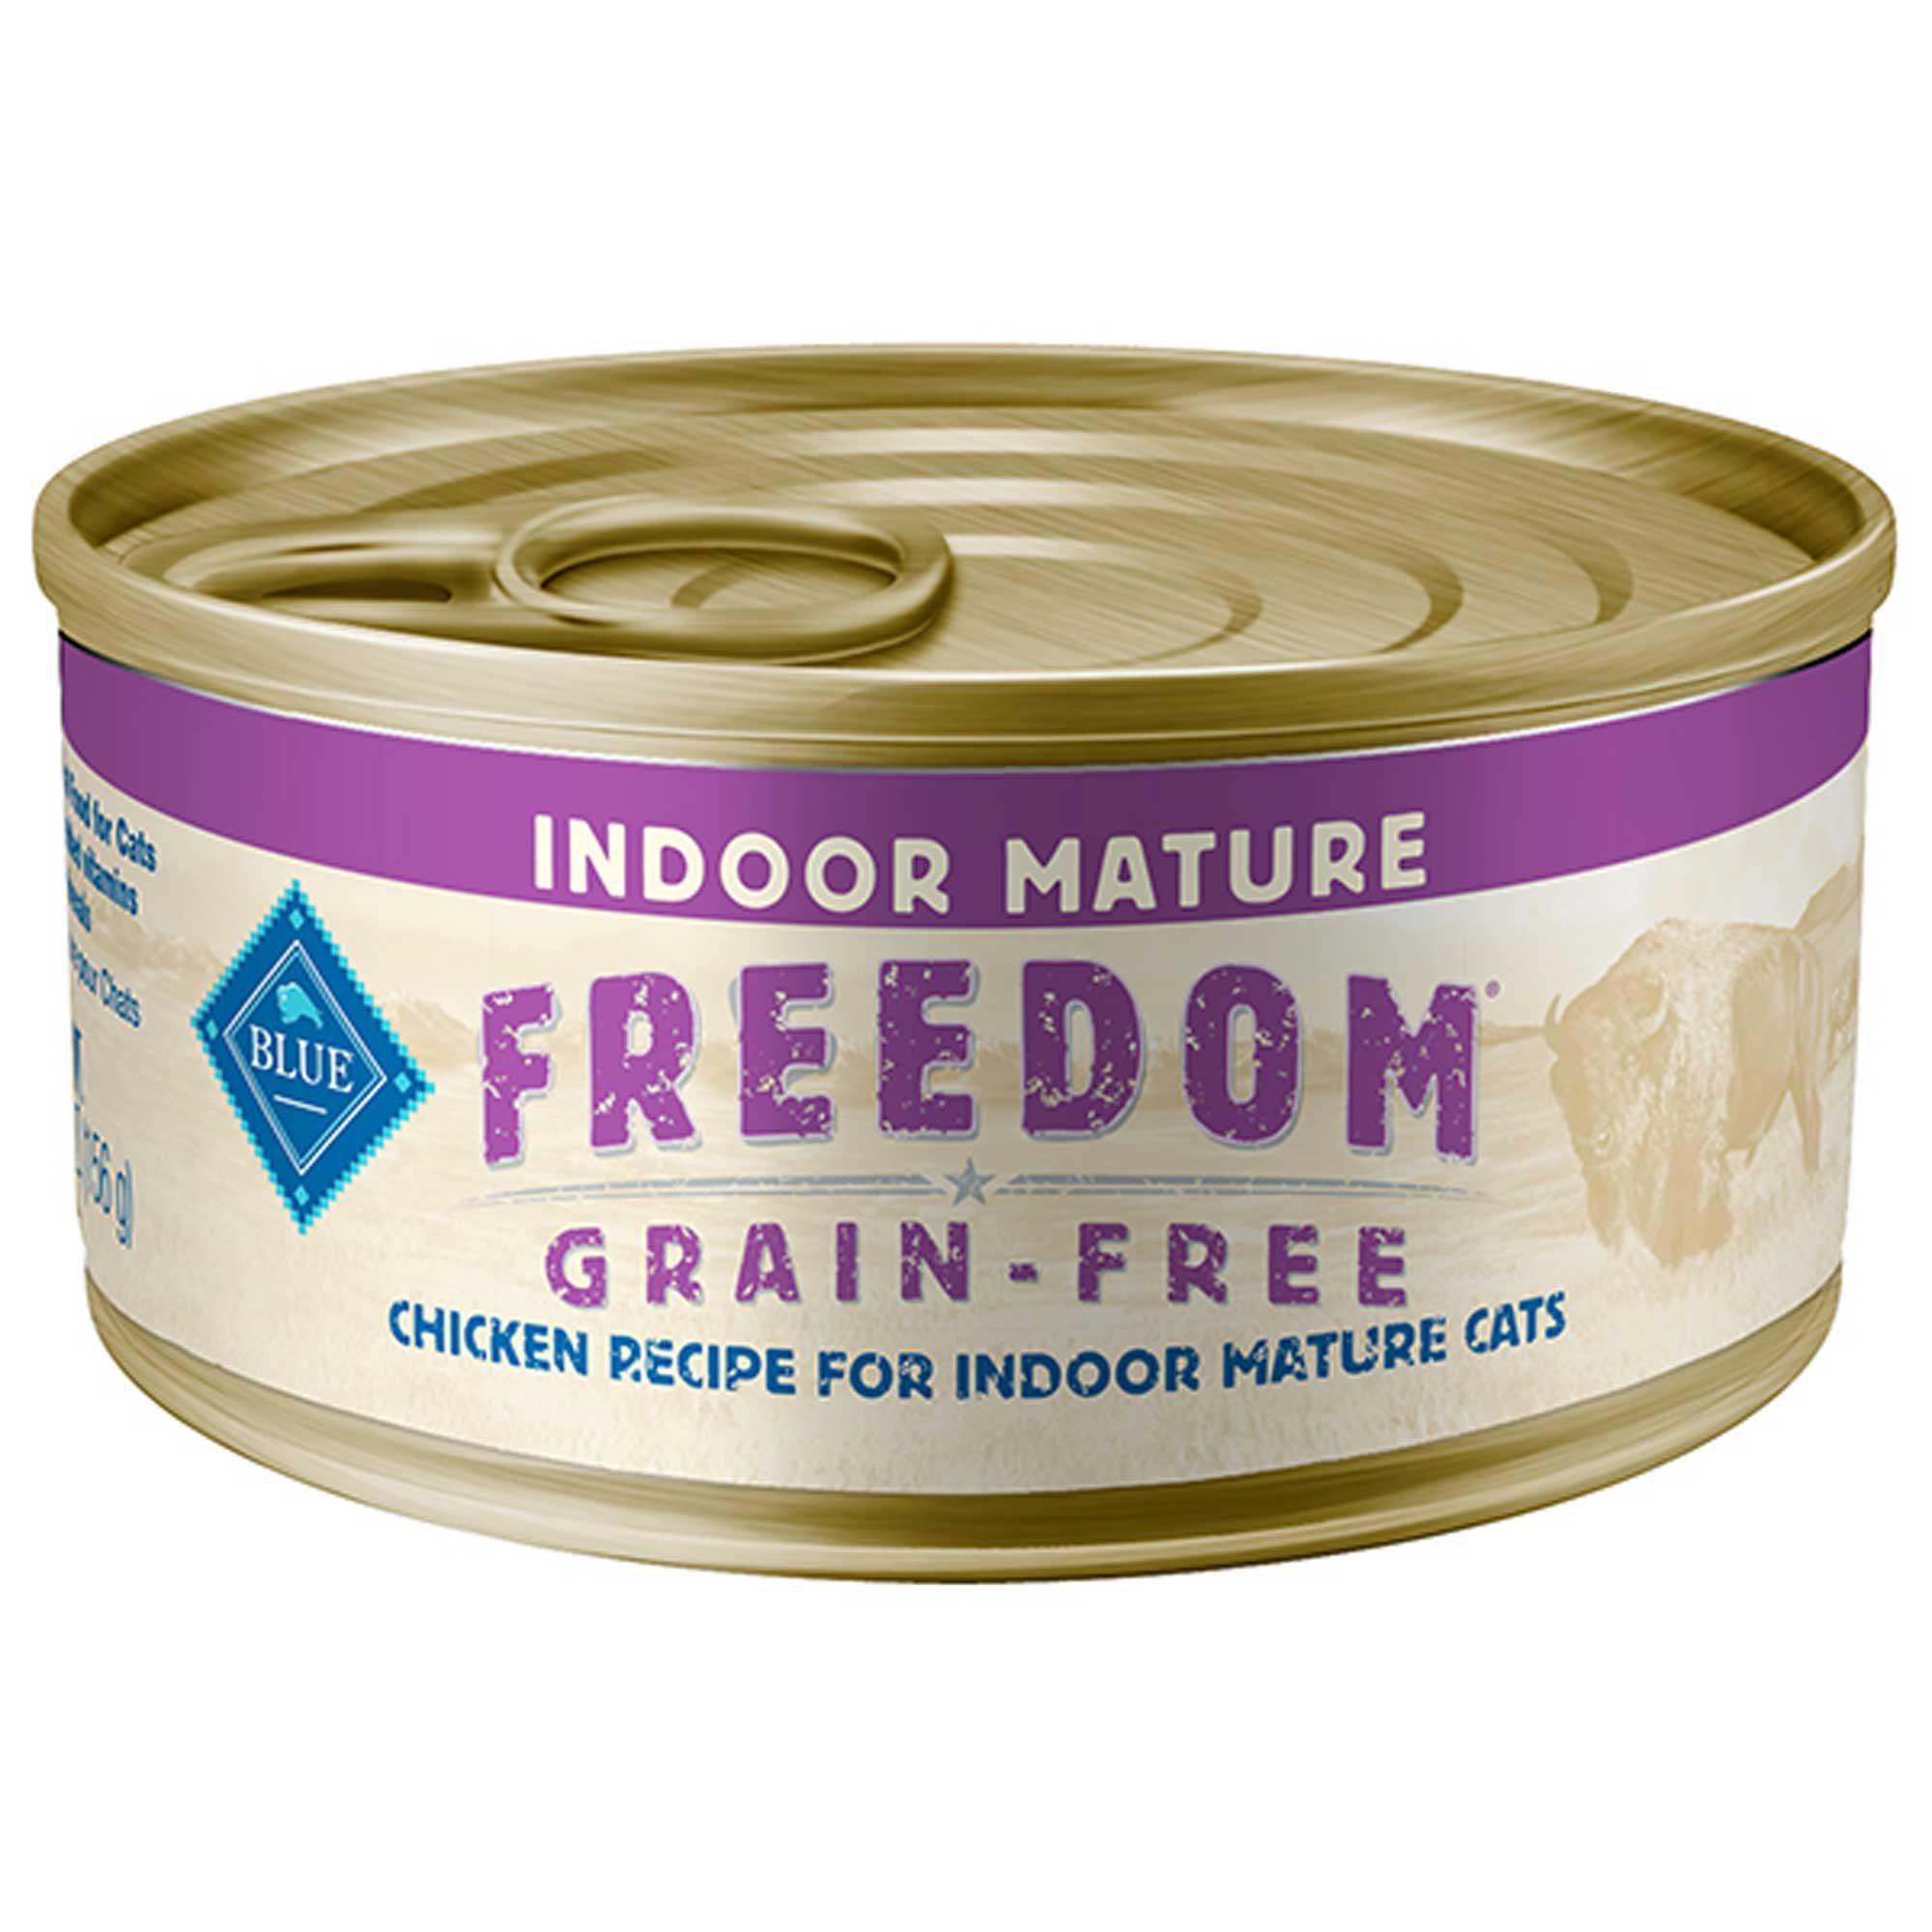 Blue Buffalo Grain Free Canned Cat Food